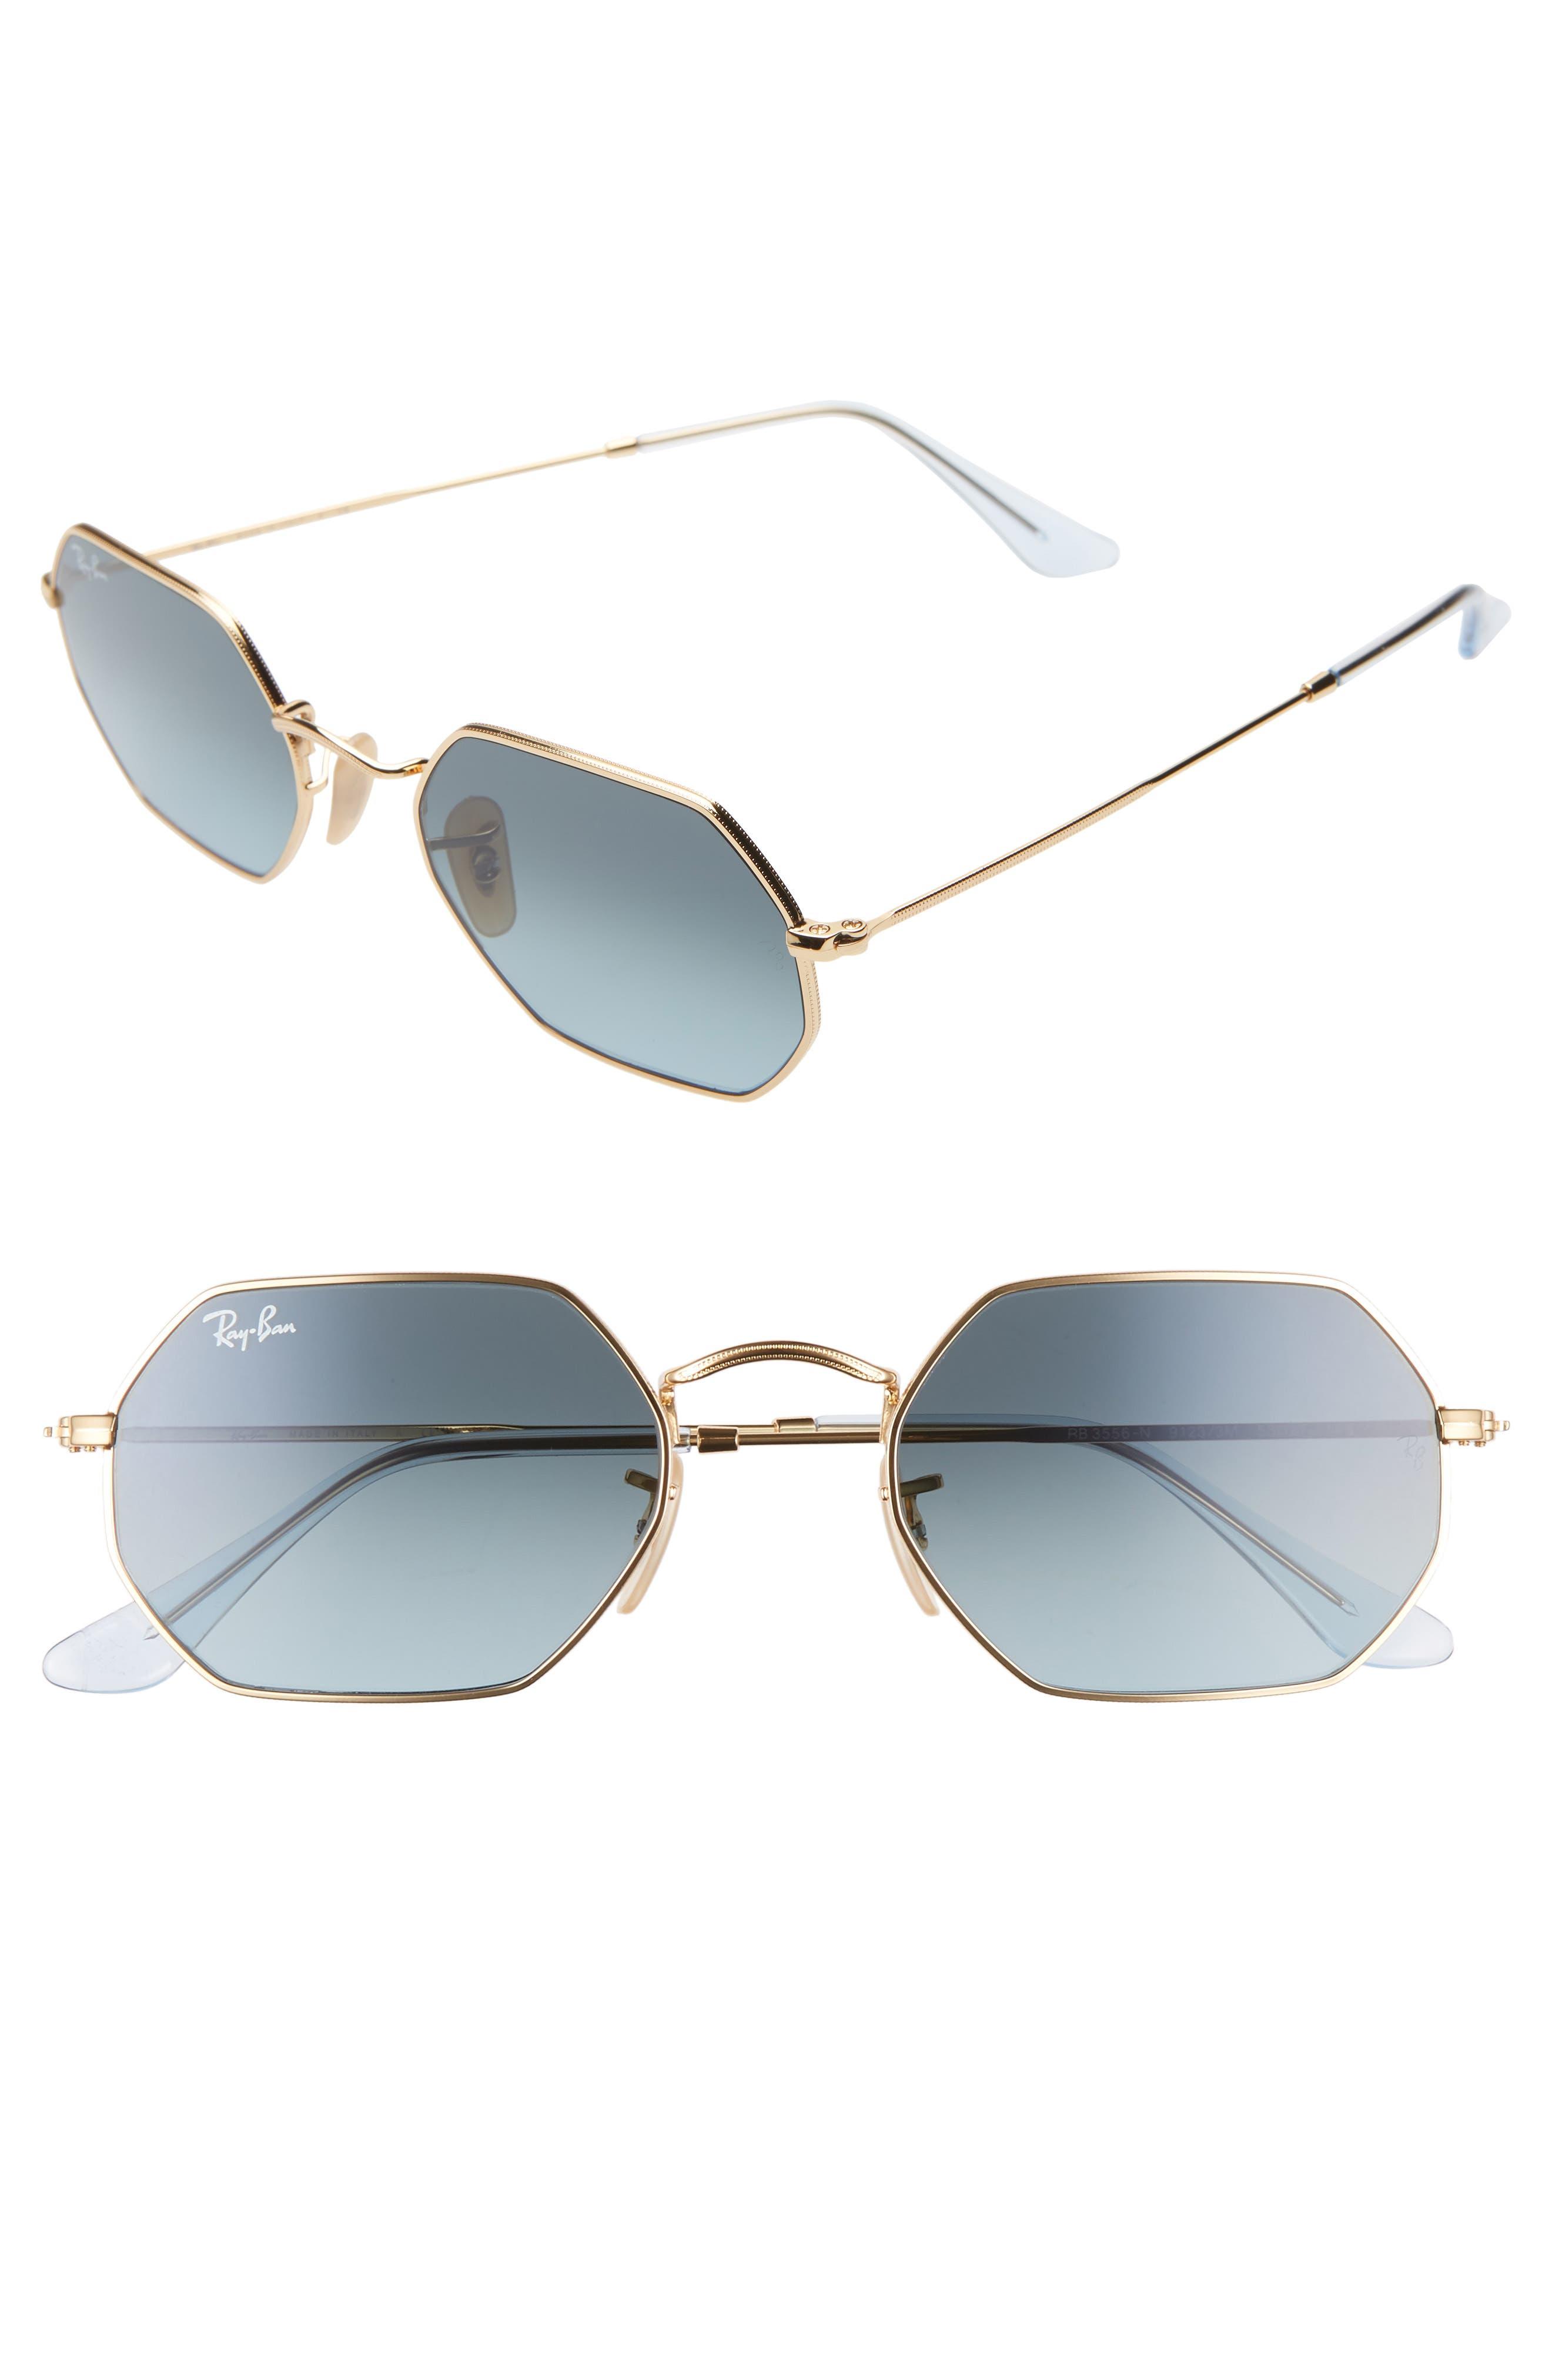 Ray-Ban 5m Rectangular Sunglasses - Gold/ Blue Gradient